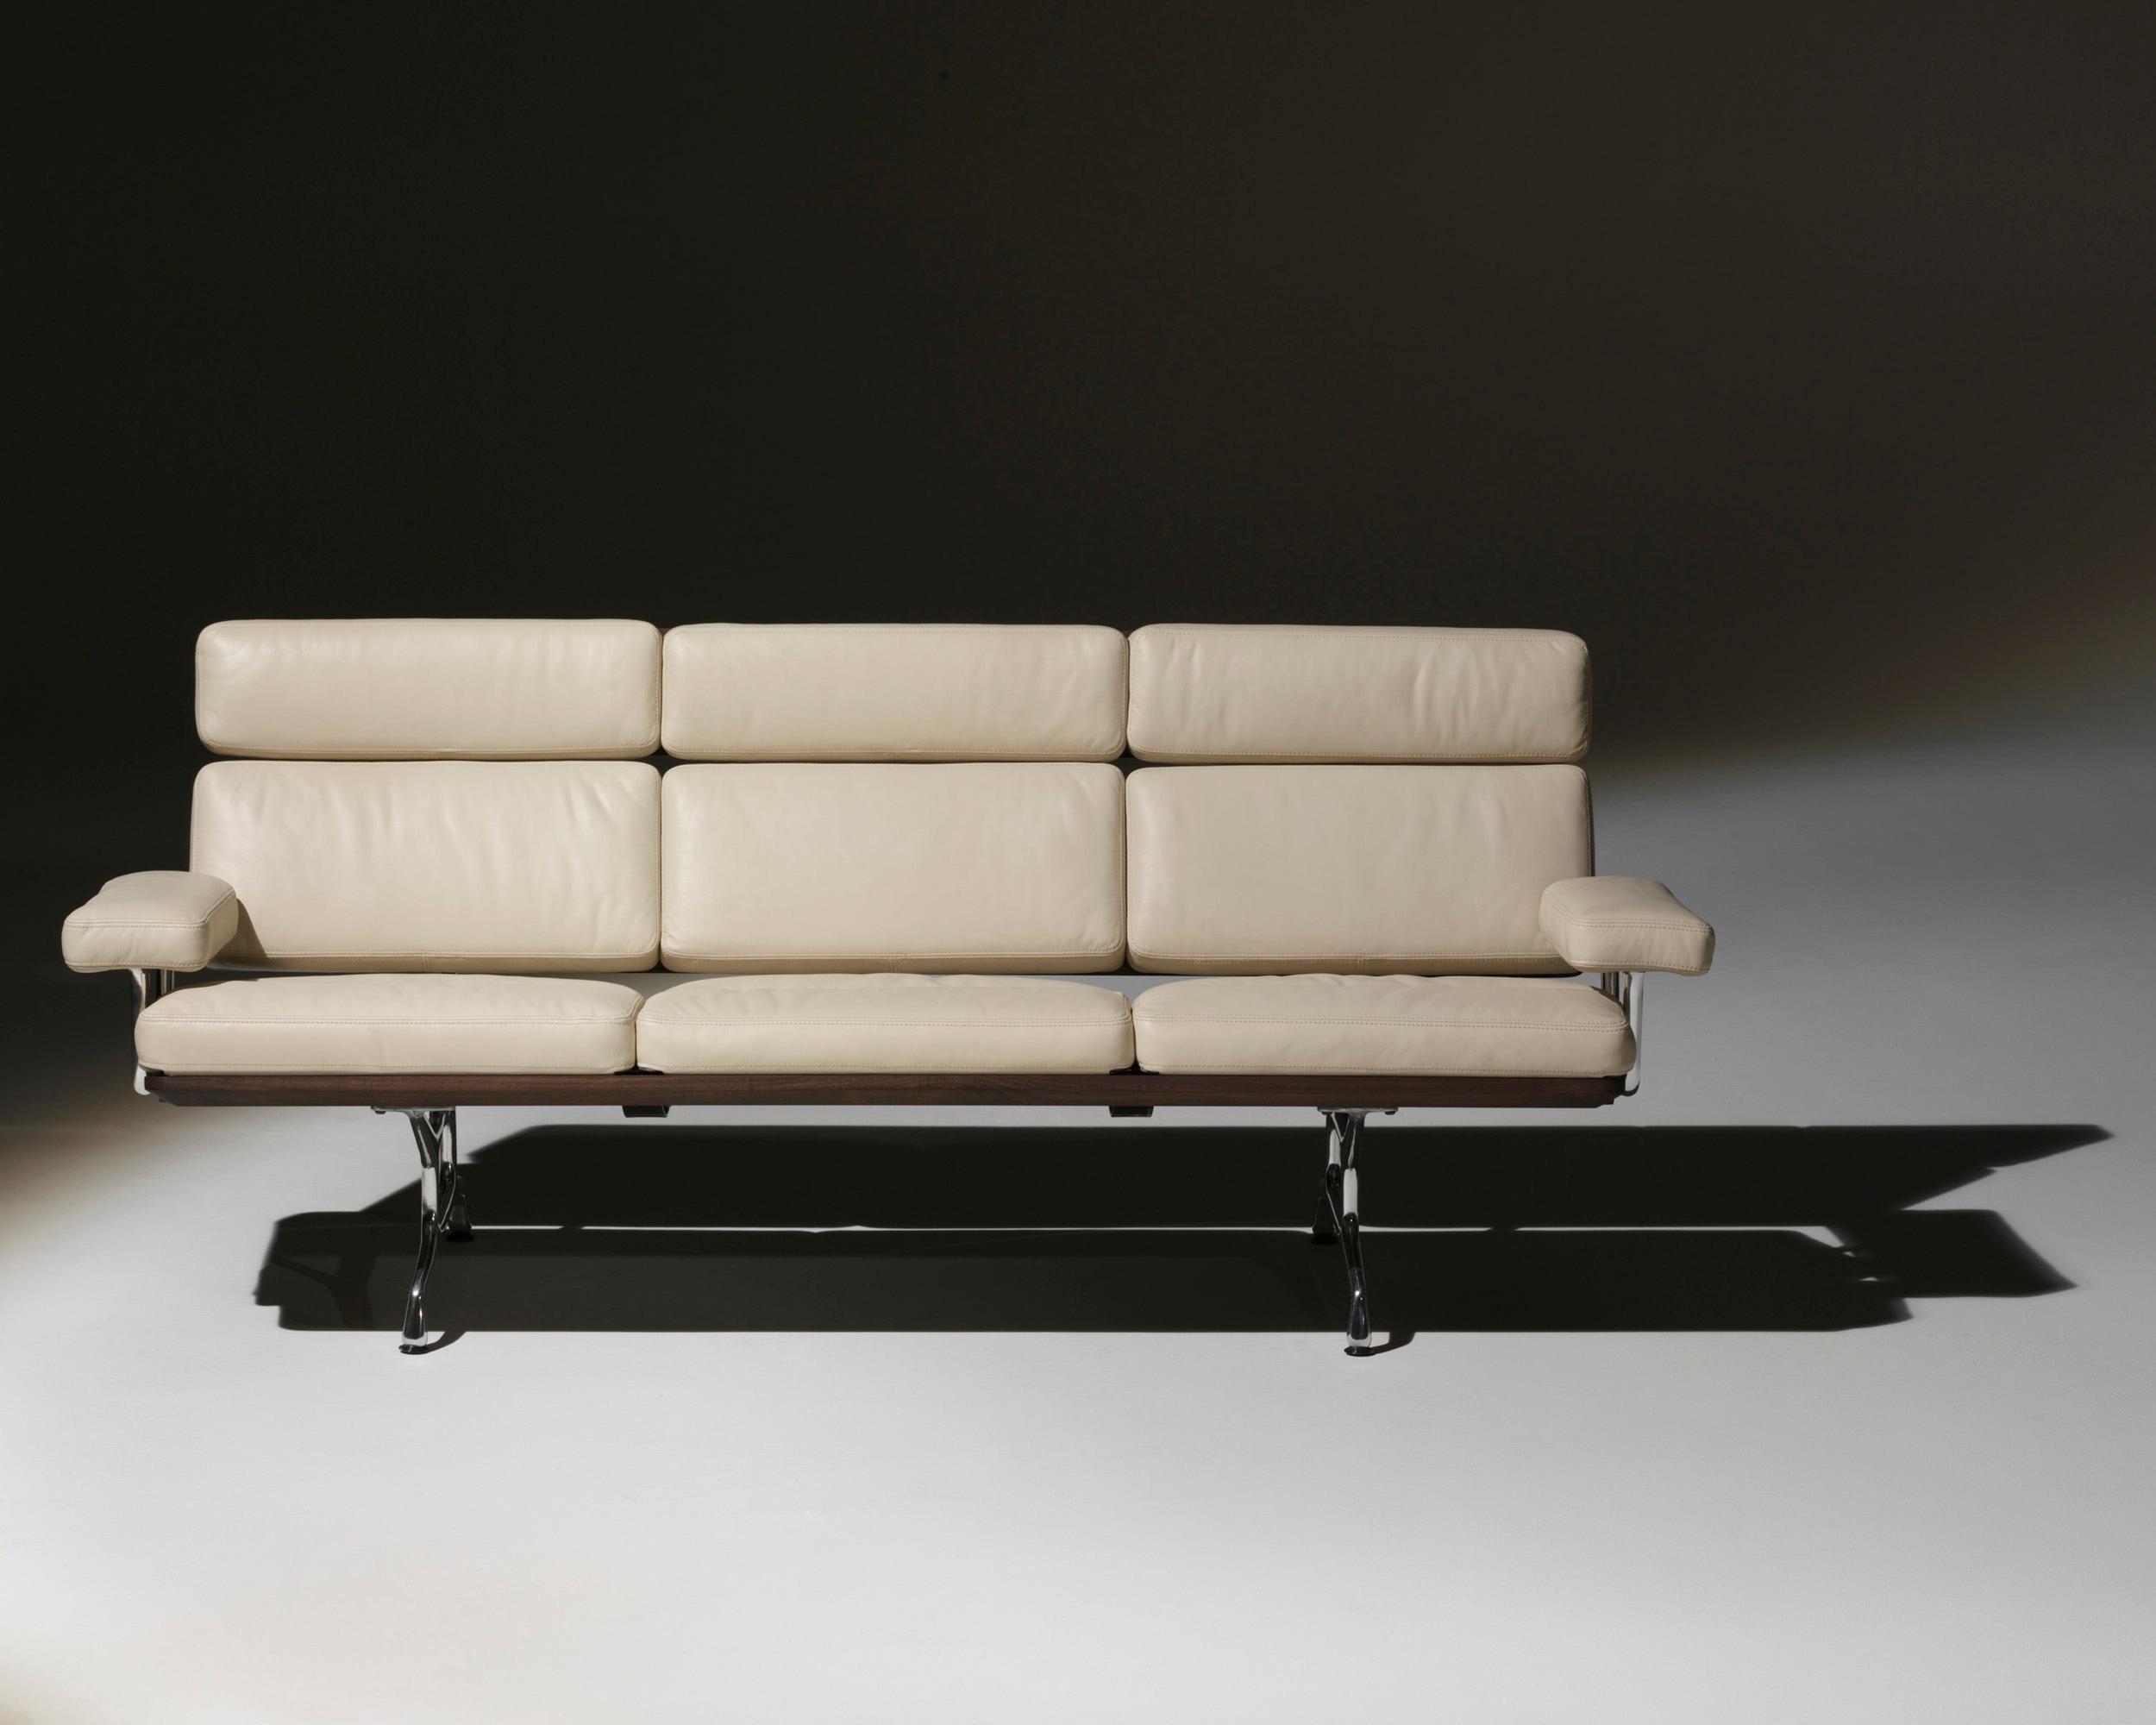 Herman Miller Eames Sofa 3 Seat Sofa Gr Shop Canada